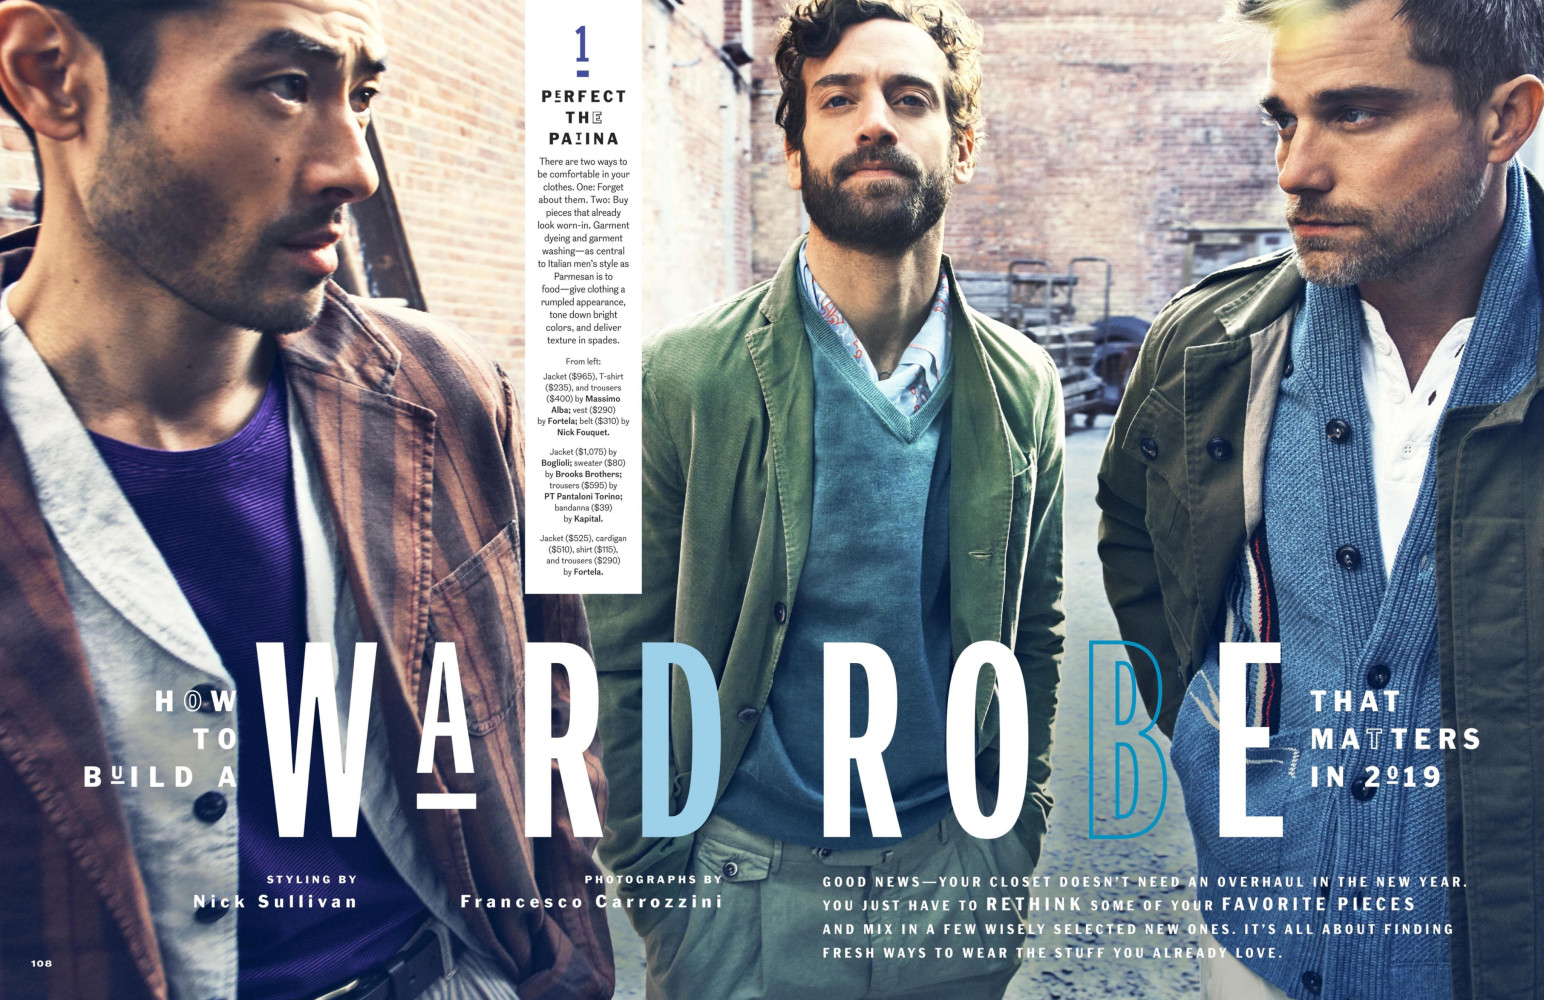 Thom Gwin for Esquire Magazine shot by Francesco Carrozzini